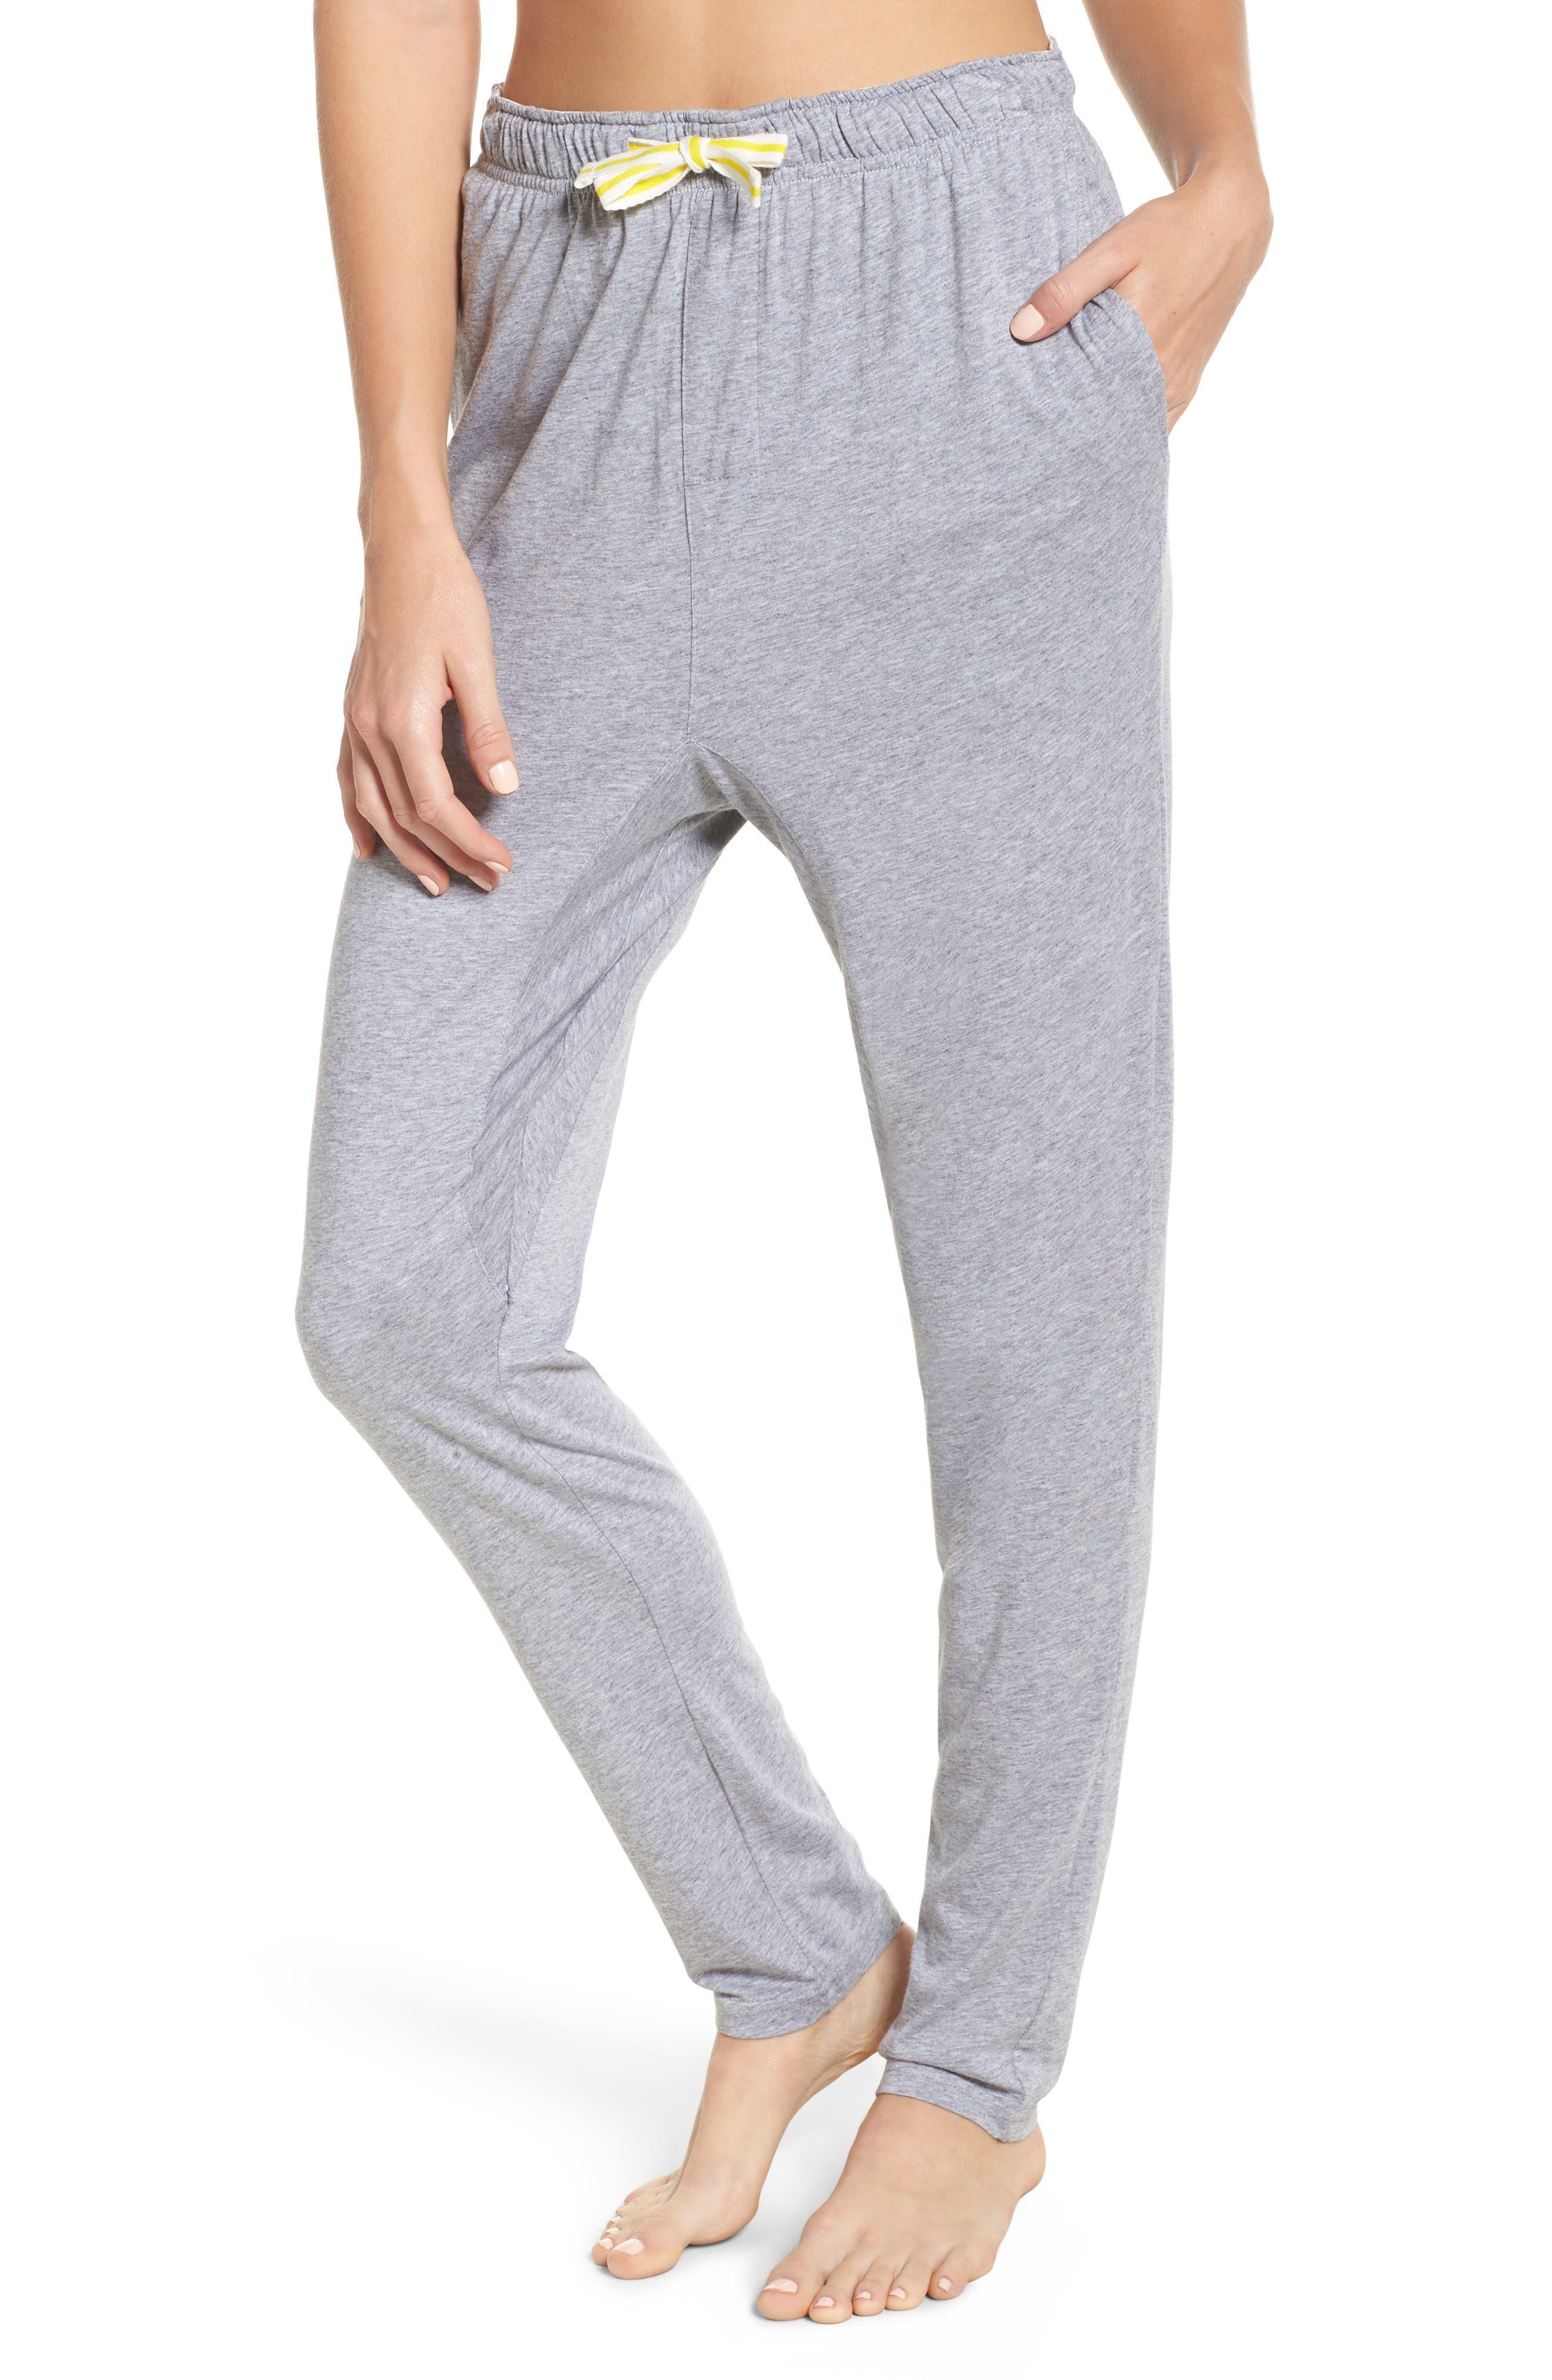 Alice Lounge Pants,                         Main,                         color, Plain Grey Marle